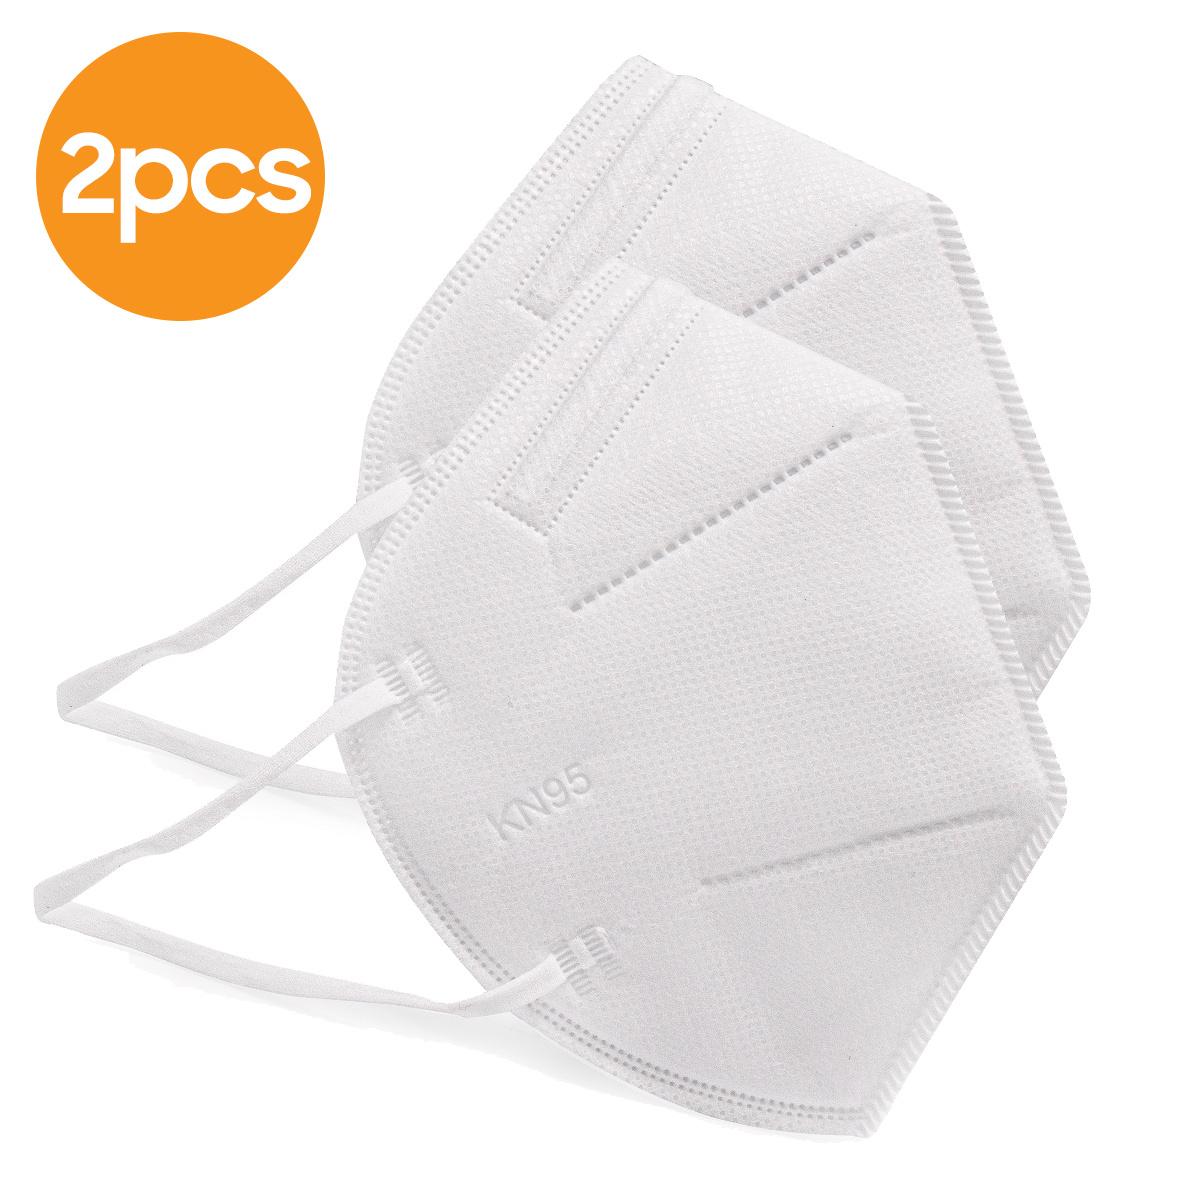 KN95 CE FFP2 Mondmasker met 4 lagen - Oorelastiek - 2 Pack